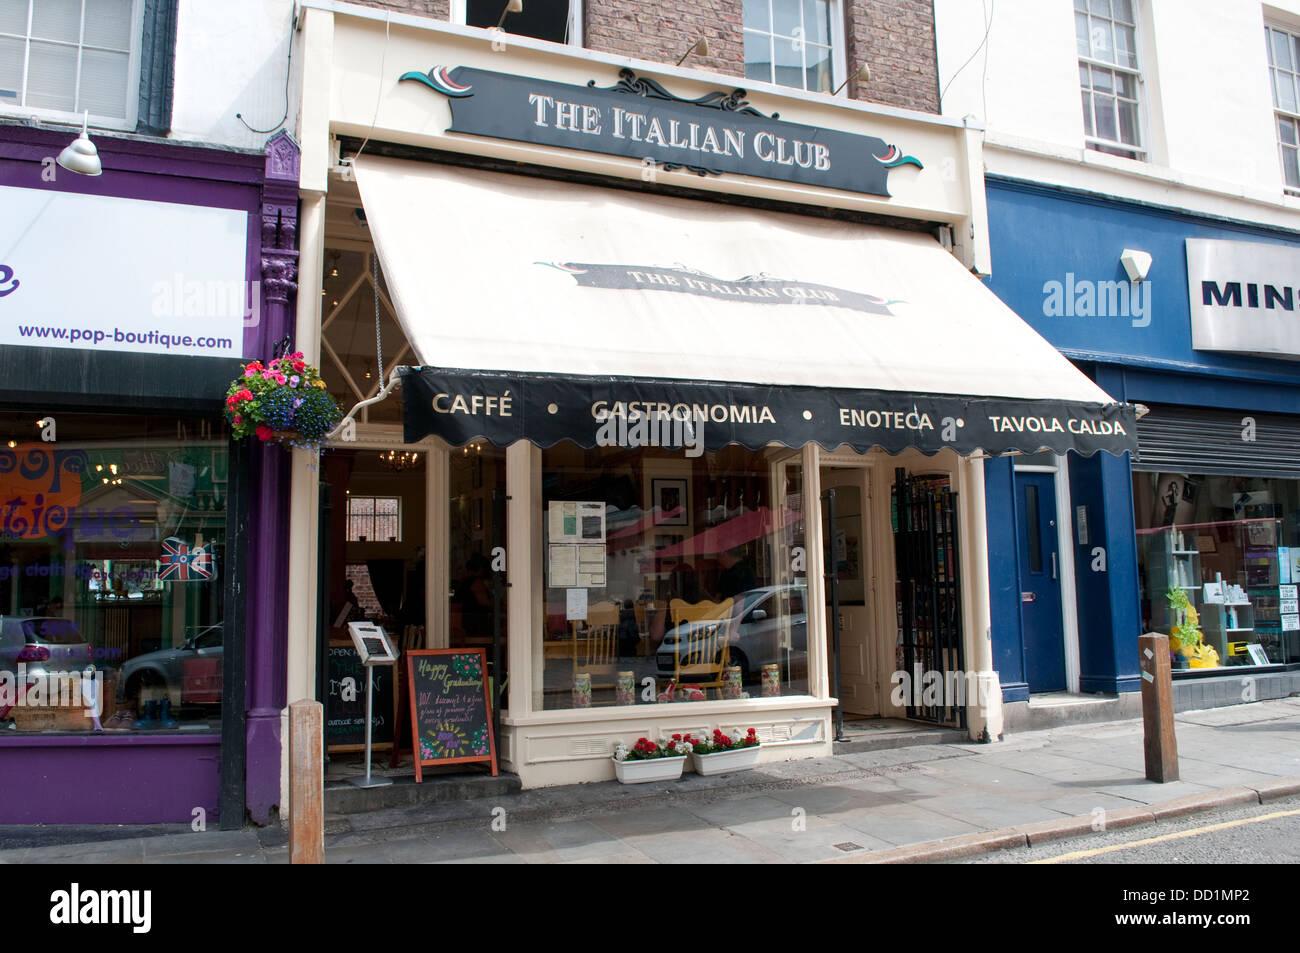 Italian Club cafe, Trendy Bold Street, Liverpool, UK - Stock Image